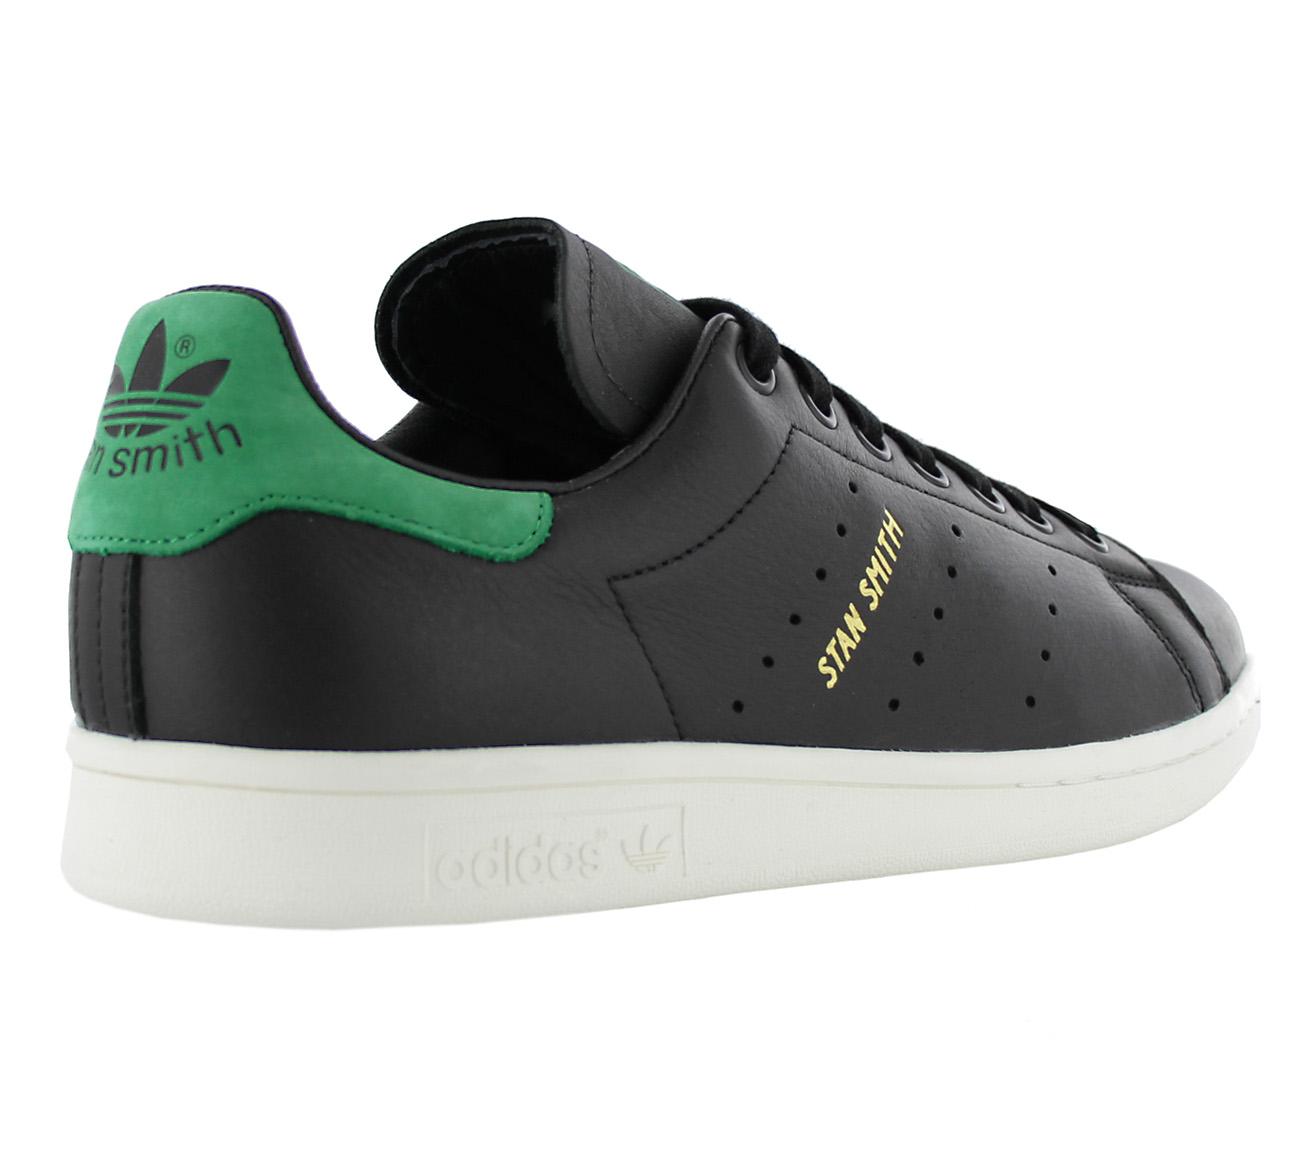 Adidas Originals Stan Smith Cuero Damas Botas Negro Sneaker Bz0458 Special Summer Sale Women's Shoes Clothing, Shoes & Accessories